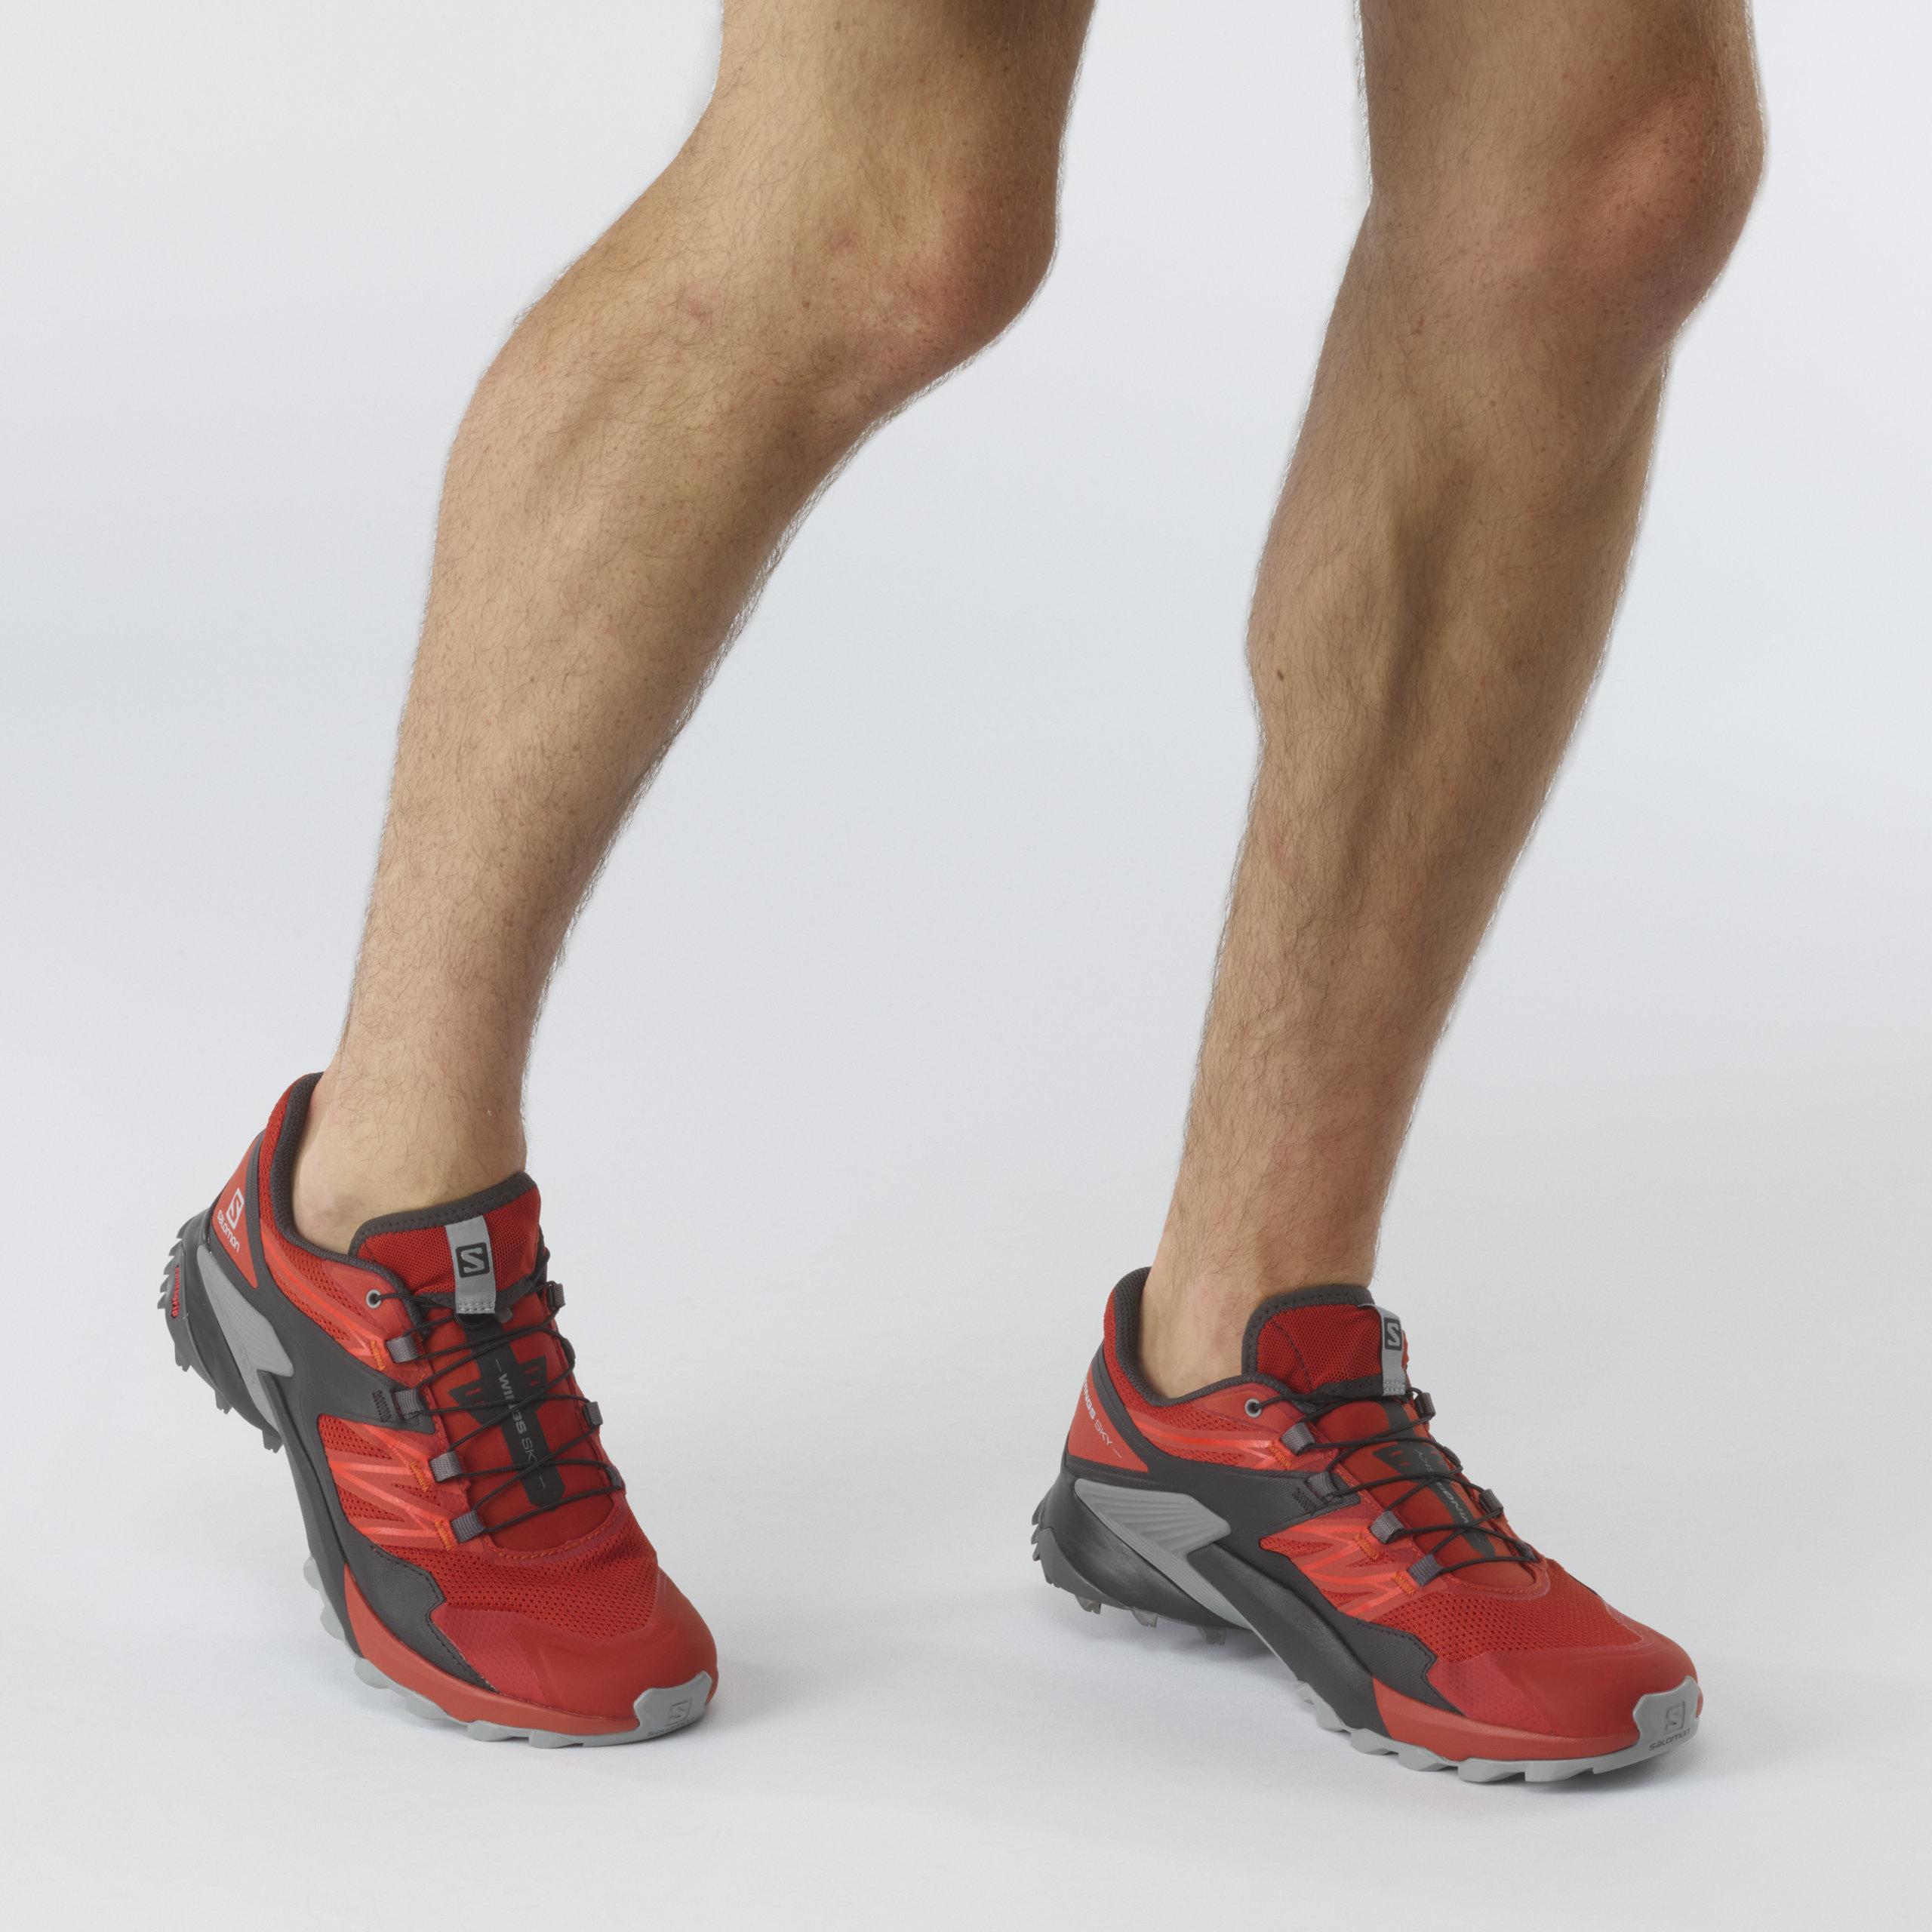 Meudon Running Company Salomon-L41386200_0_GHO_WINGS-SKY-Rooibos